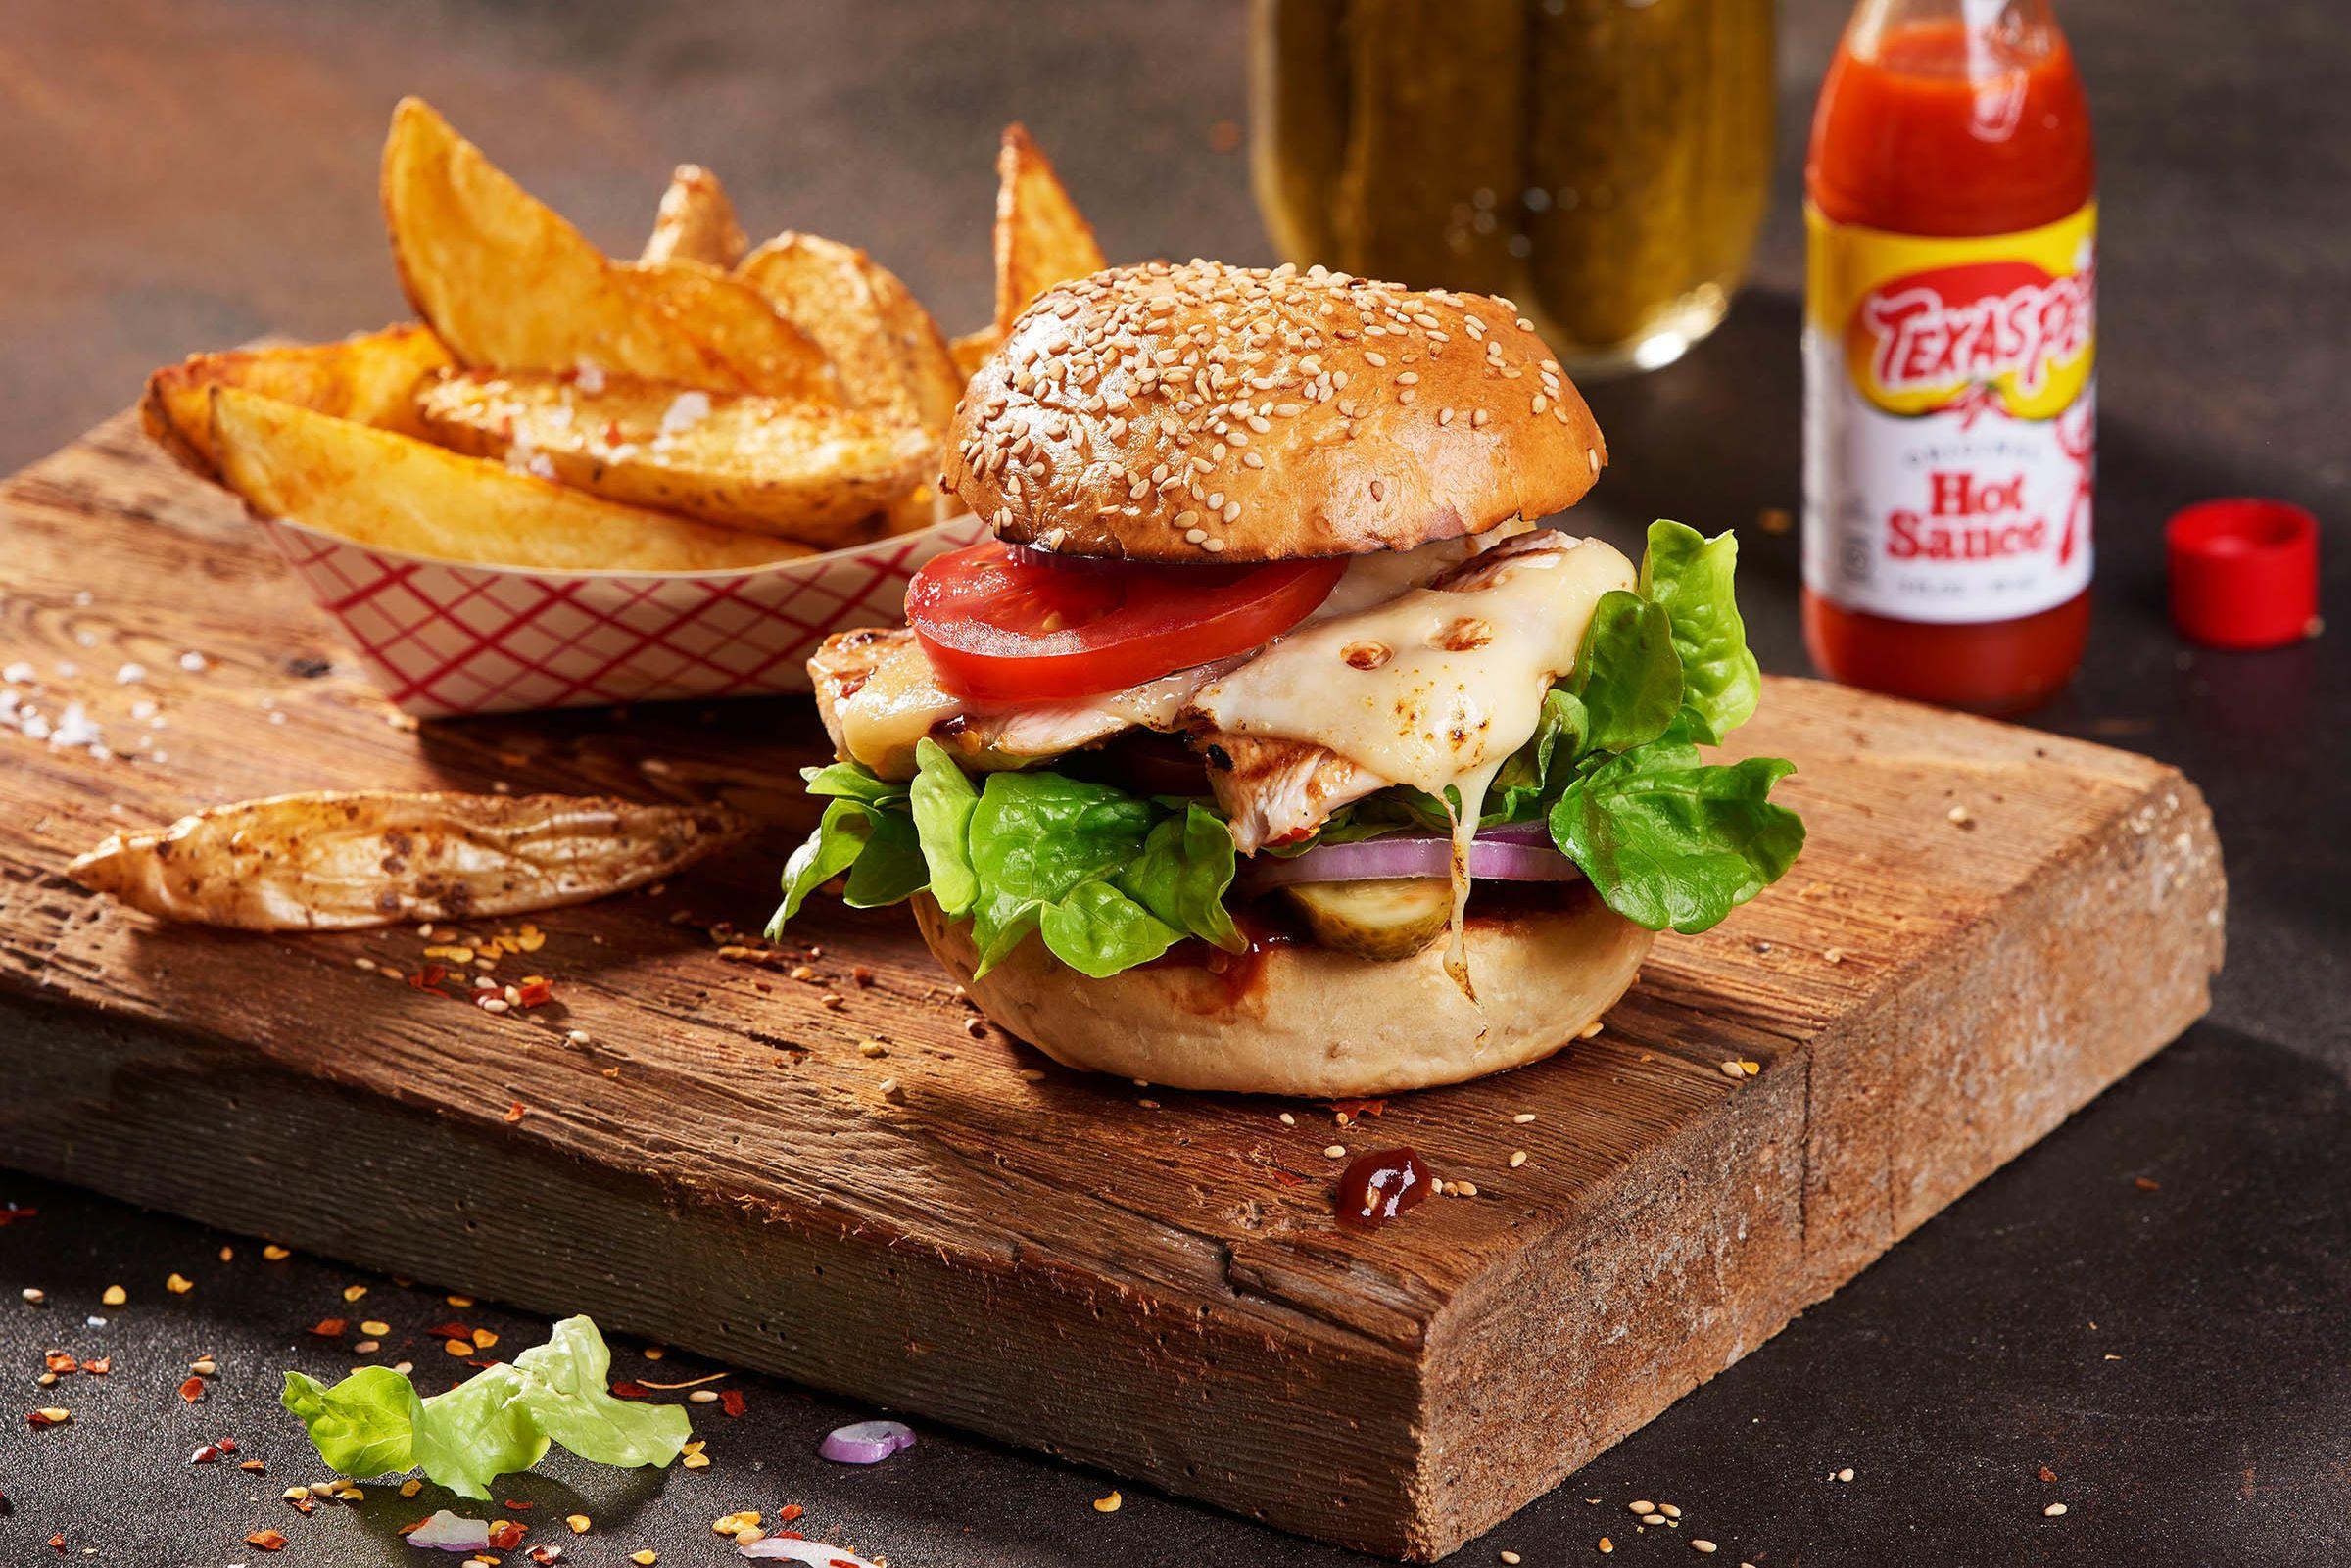 Leerdammer Rezepte Rezept Rezepte Snack Ideen Hahnchen Burger